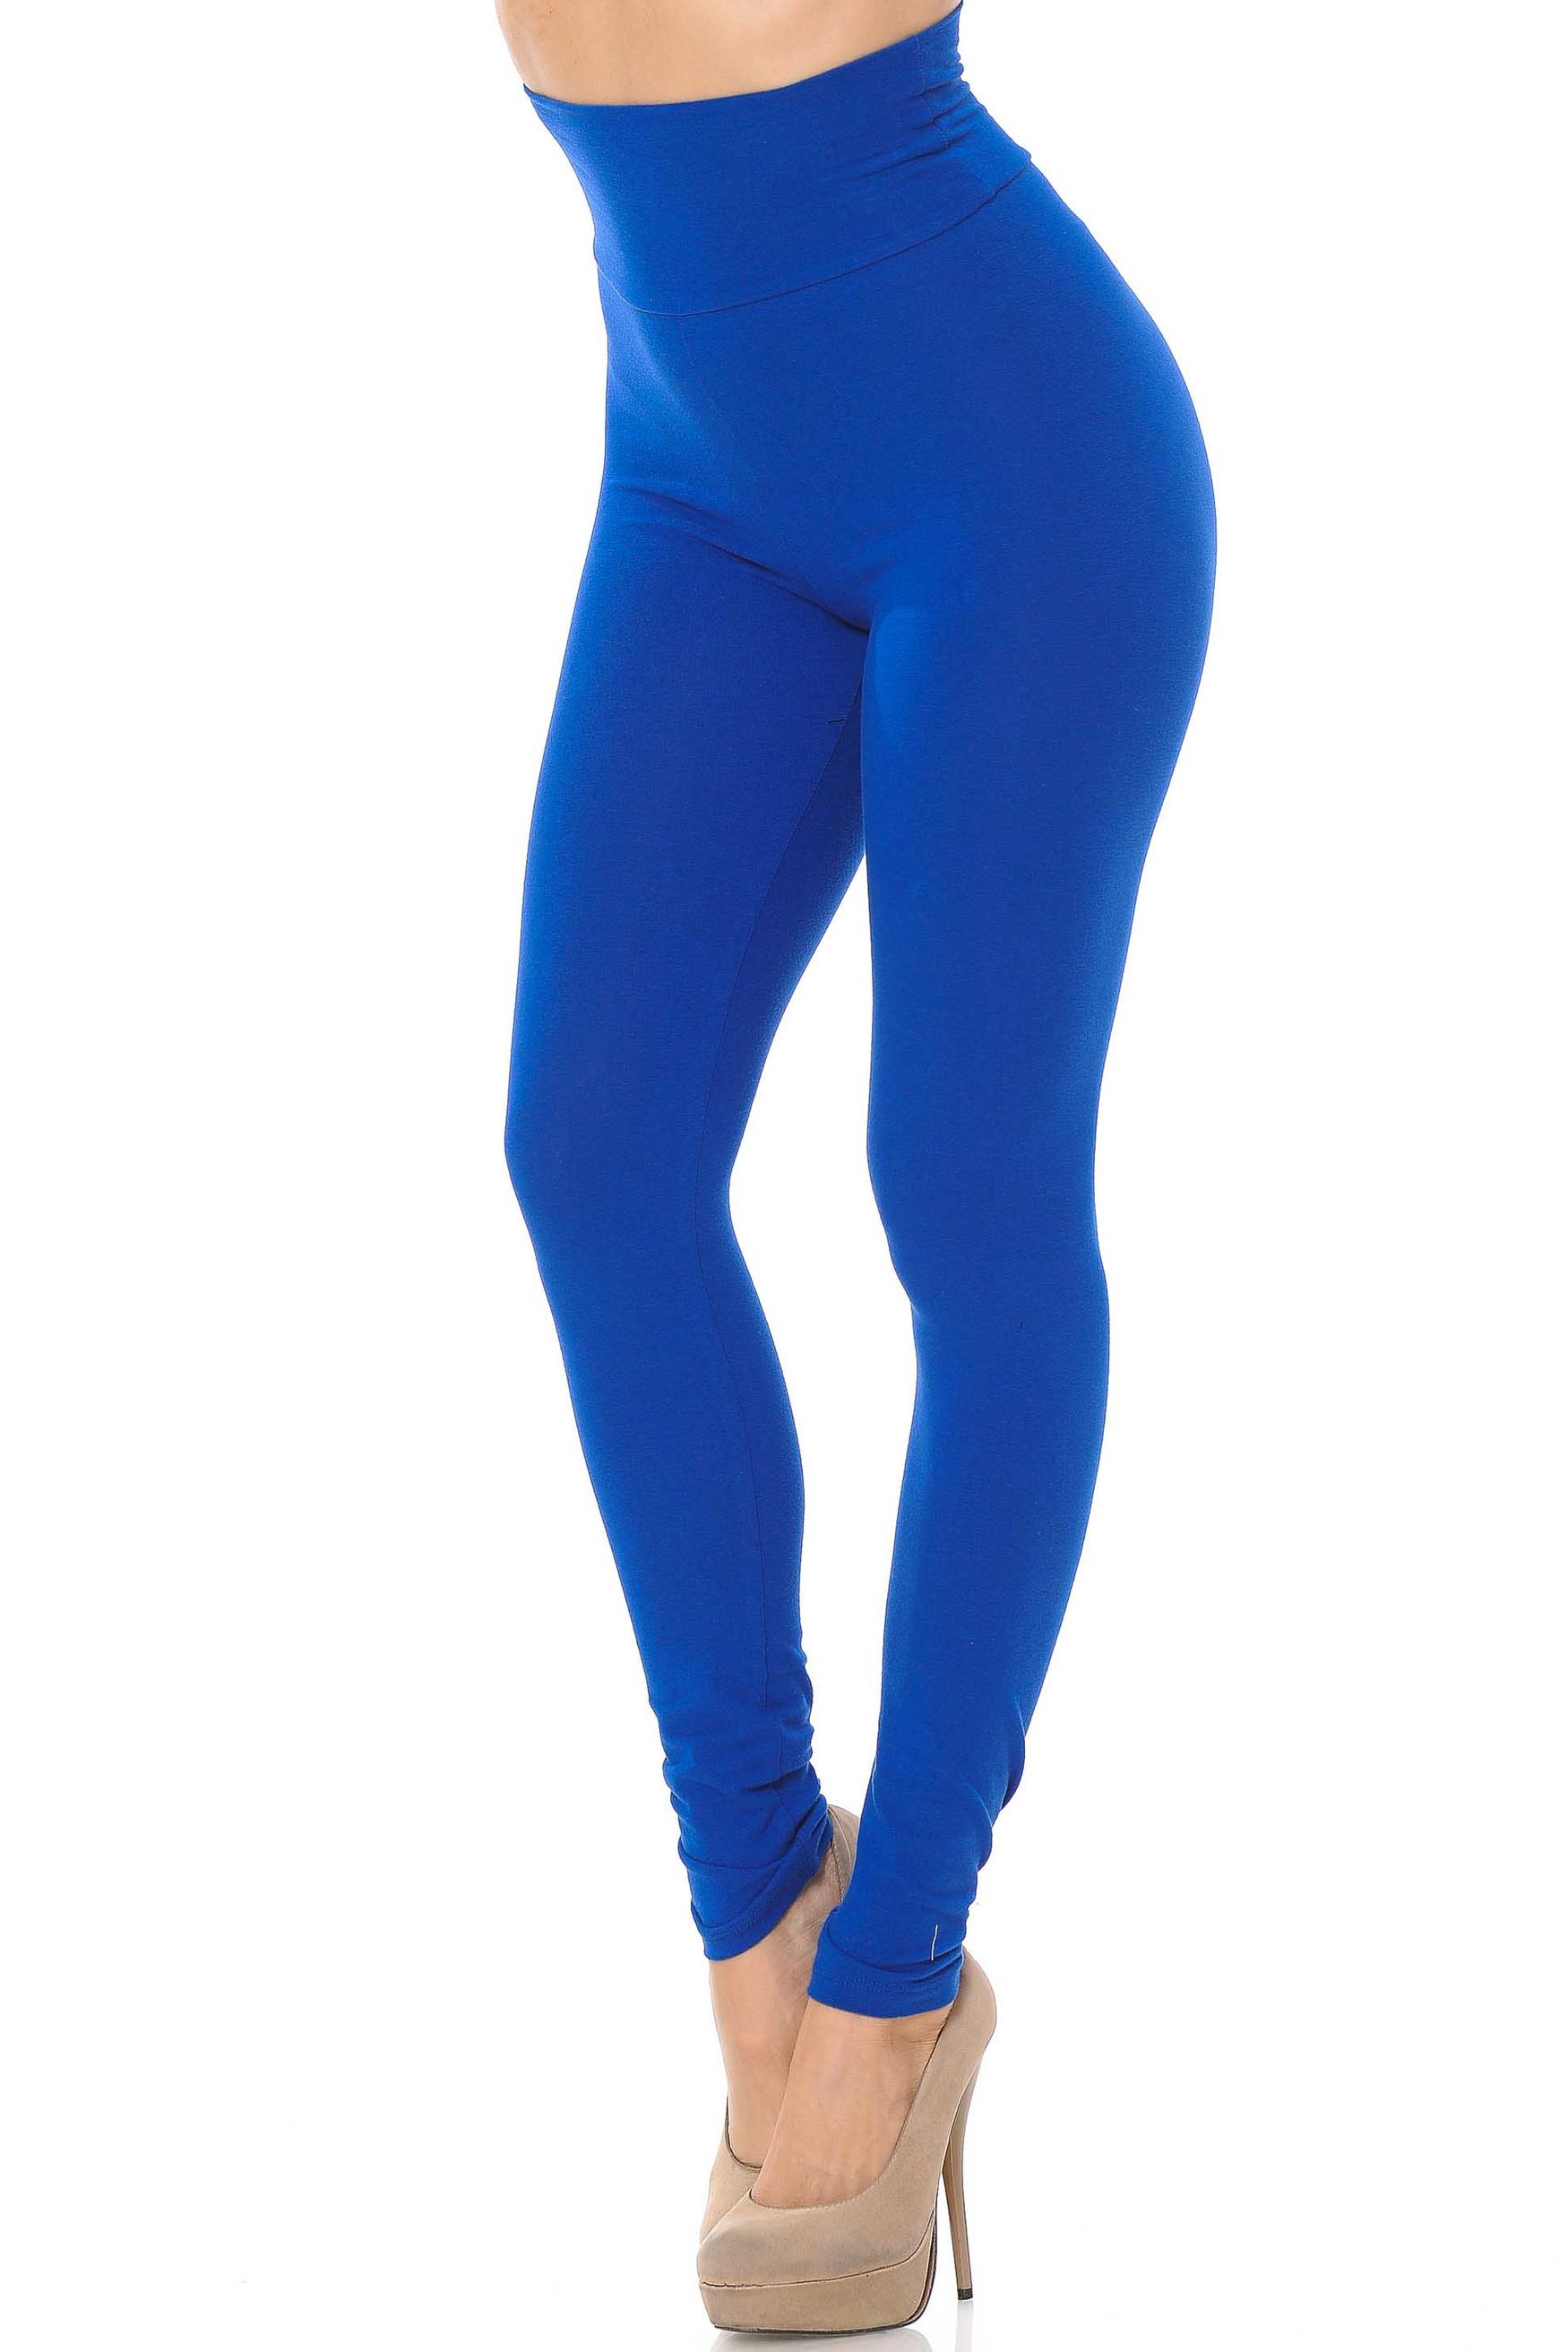 Blue USA High Waisted Cotton Leggings